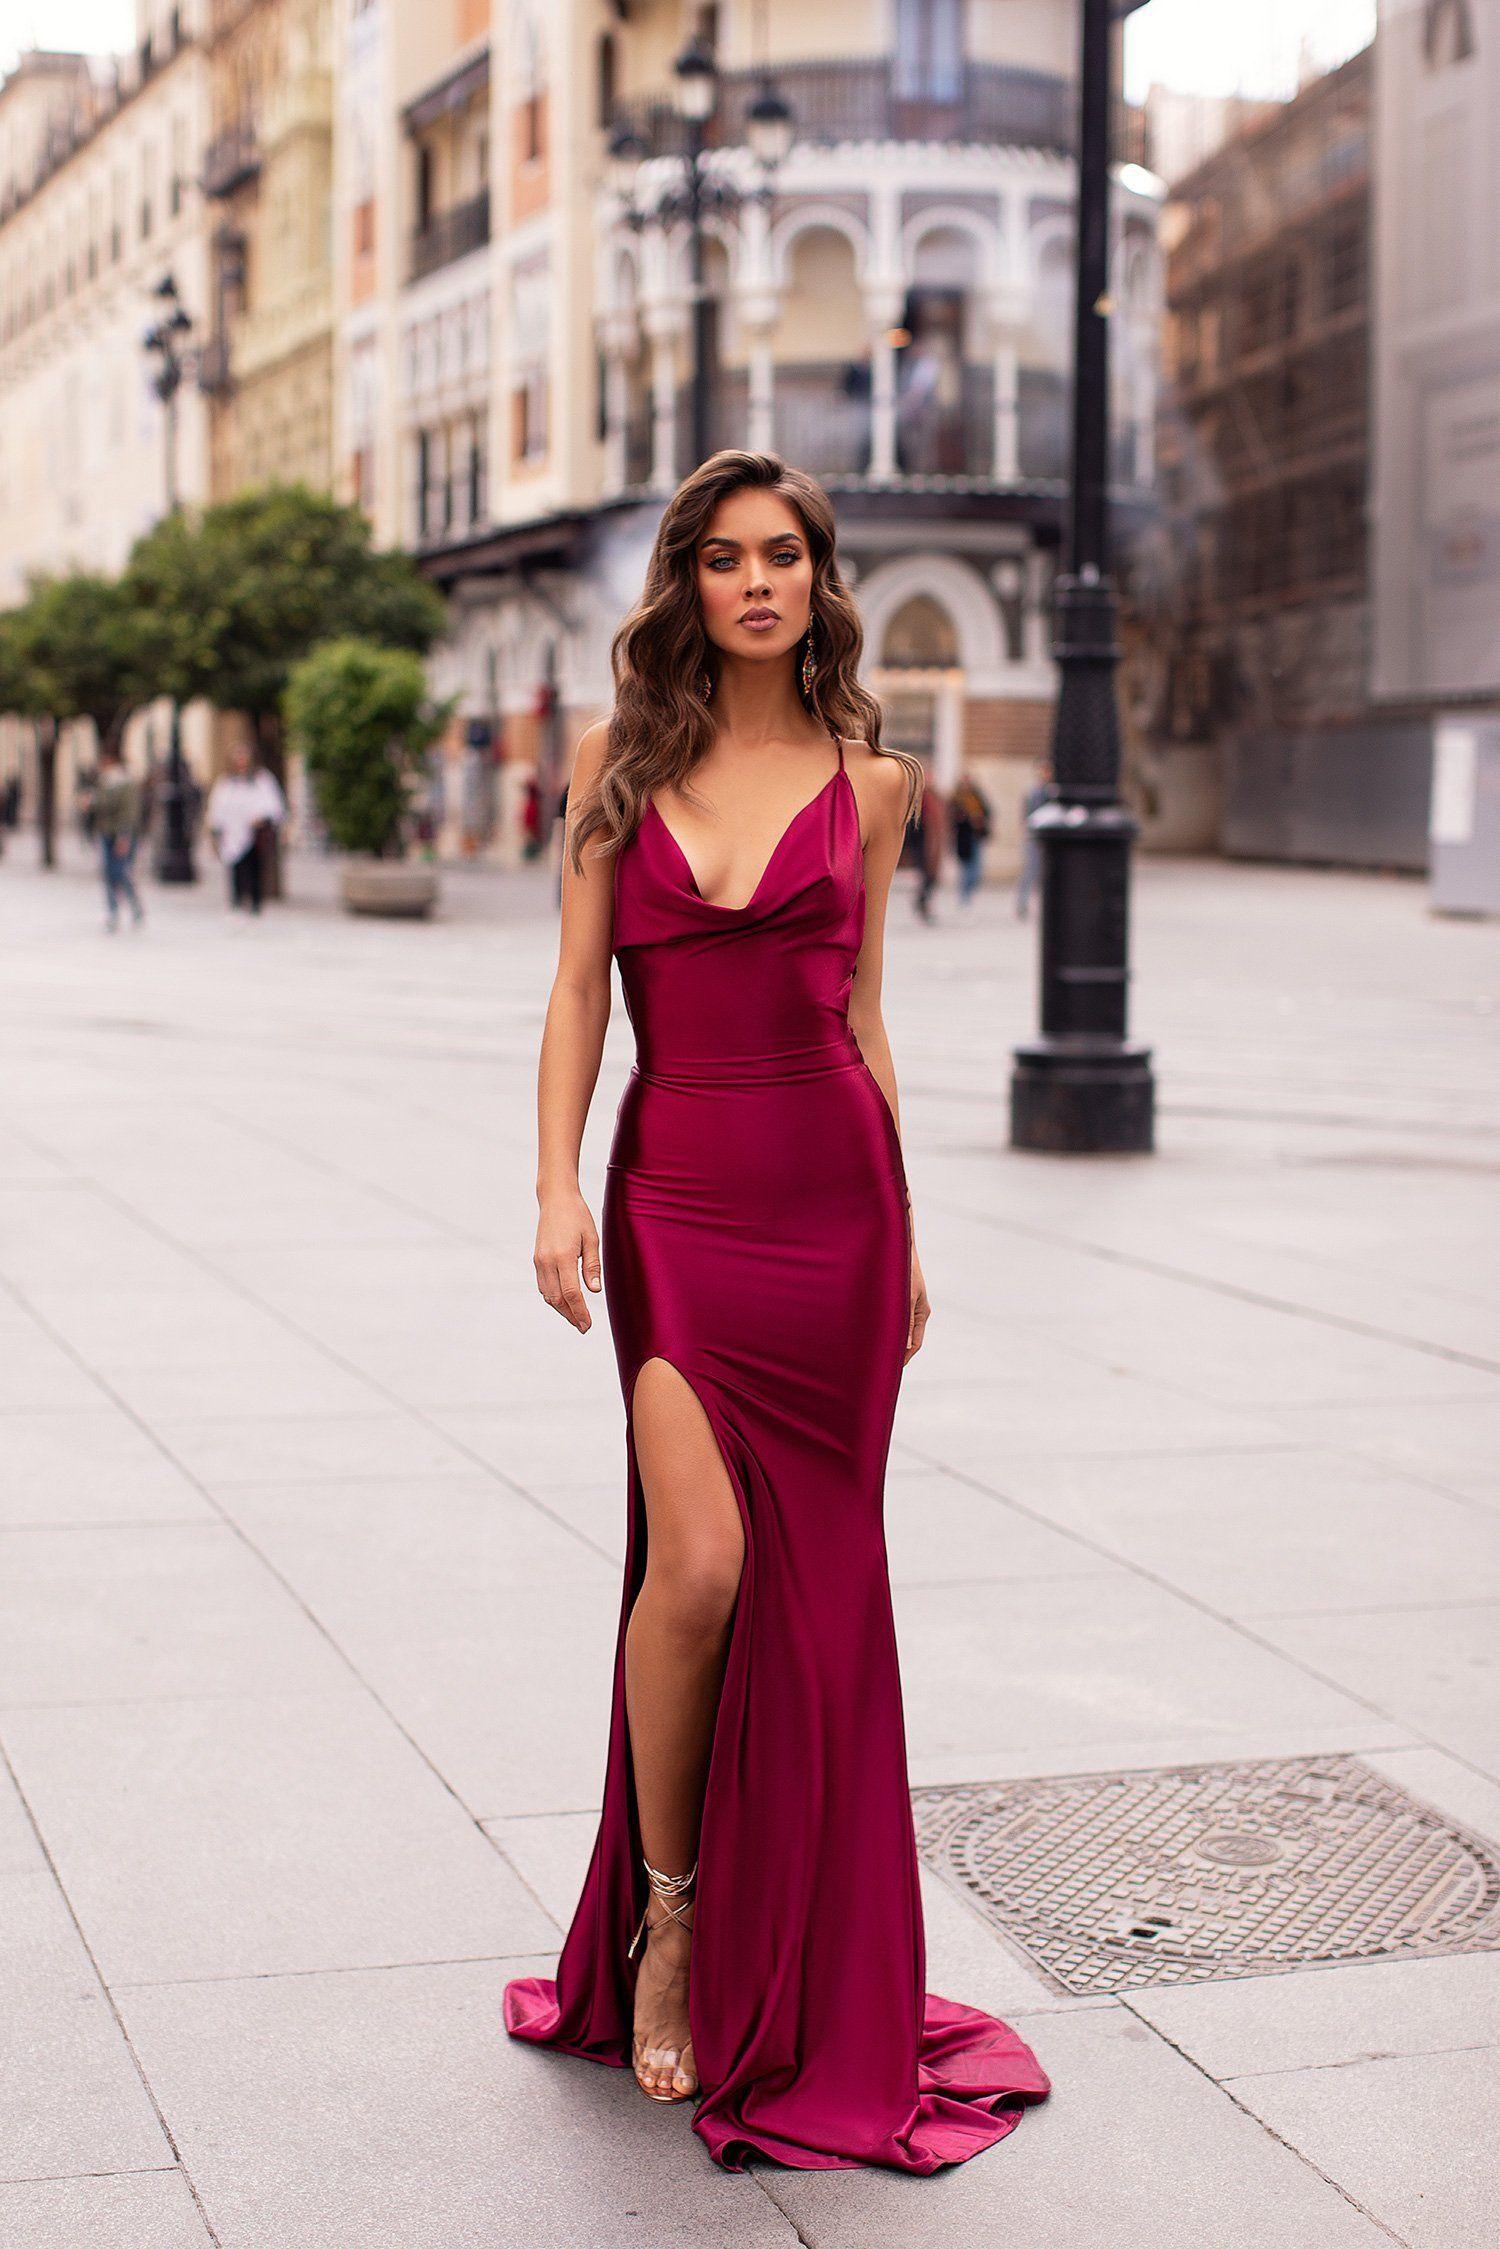 aeab7803807 Desirae - Plum in 2019 | Prom | Satin gown, Dresses, Formal dresses